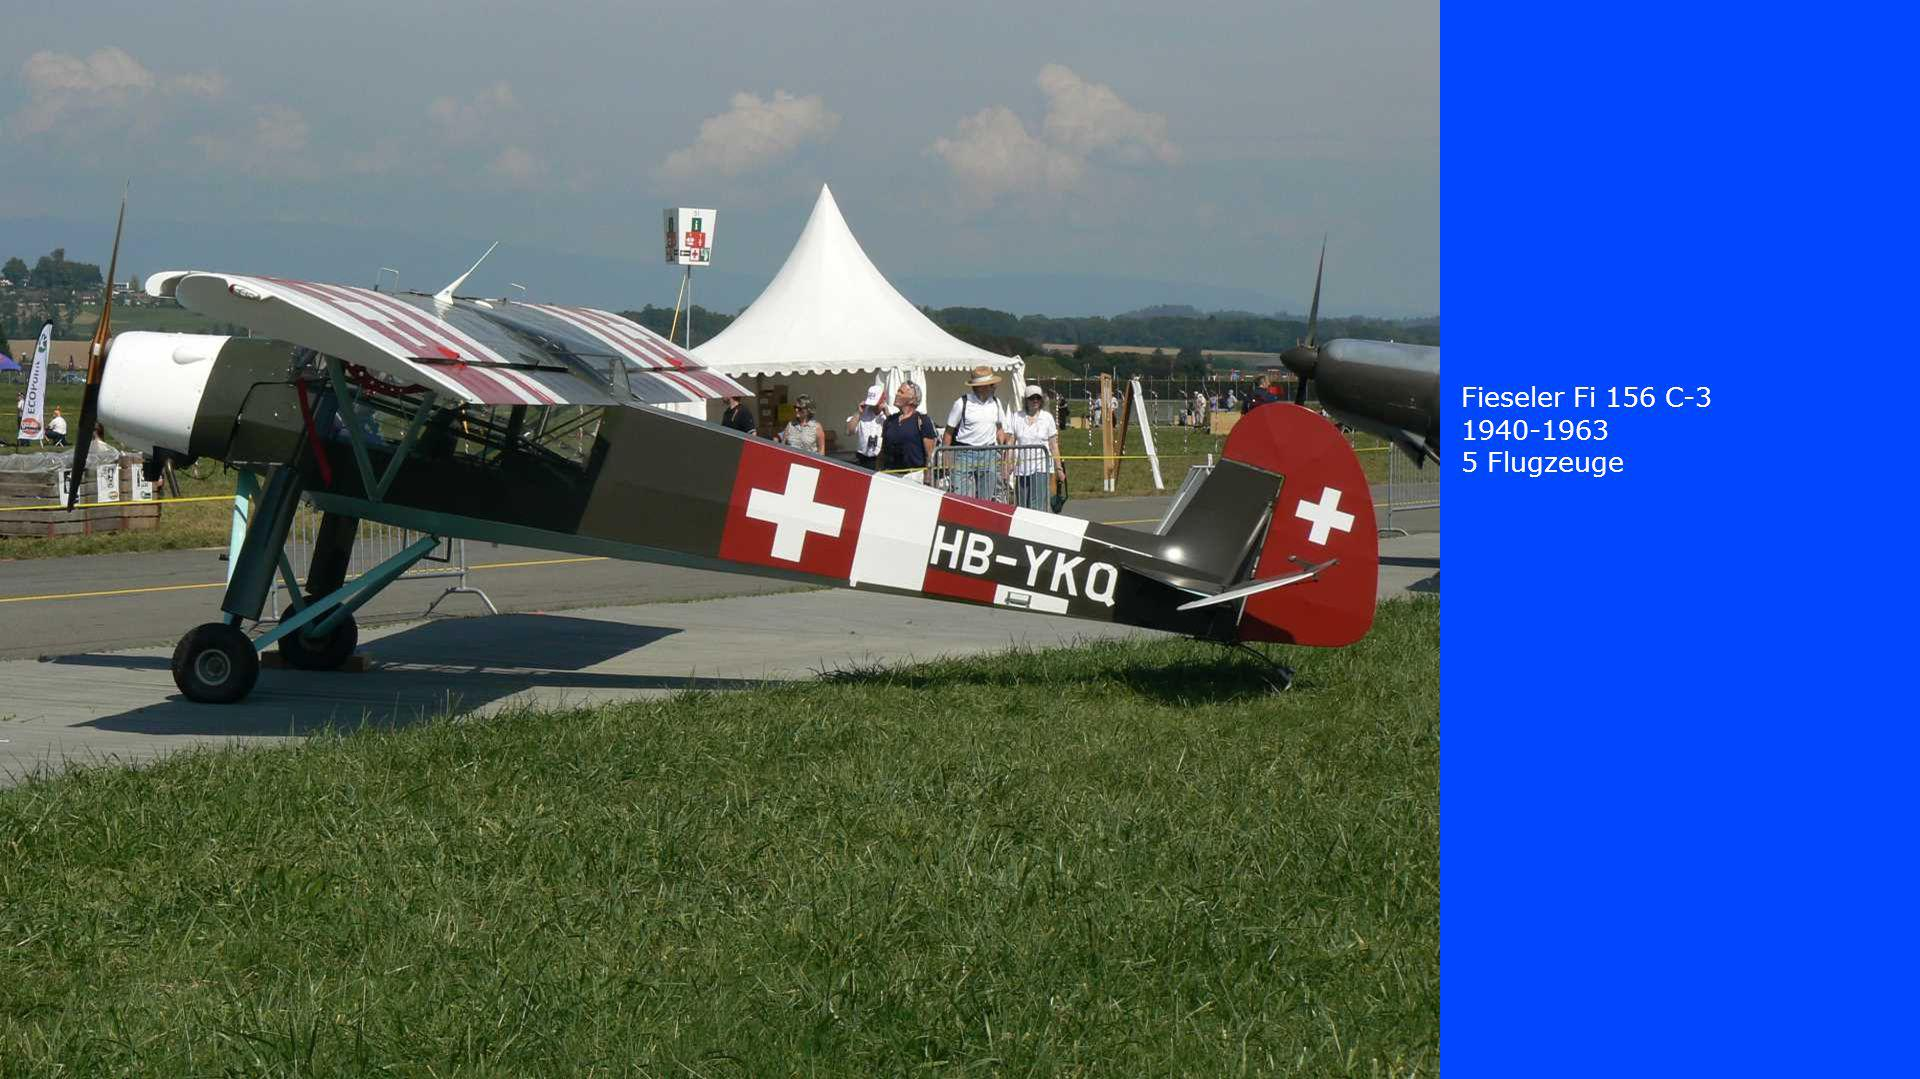 Fieseler Fi 156 C-3 1940-1963 5 Flugzeuge